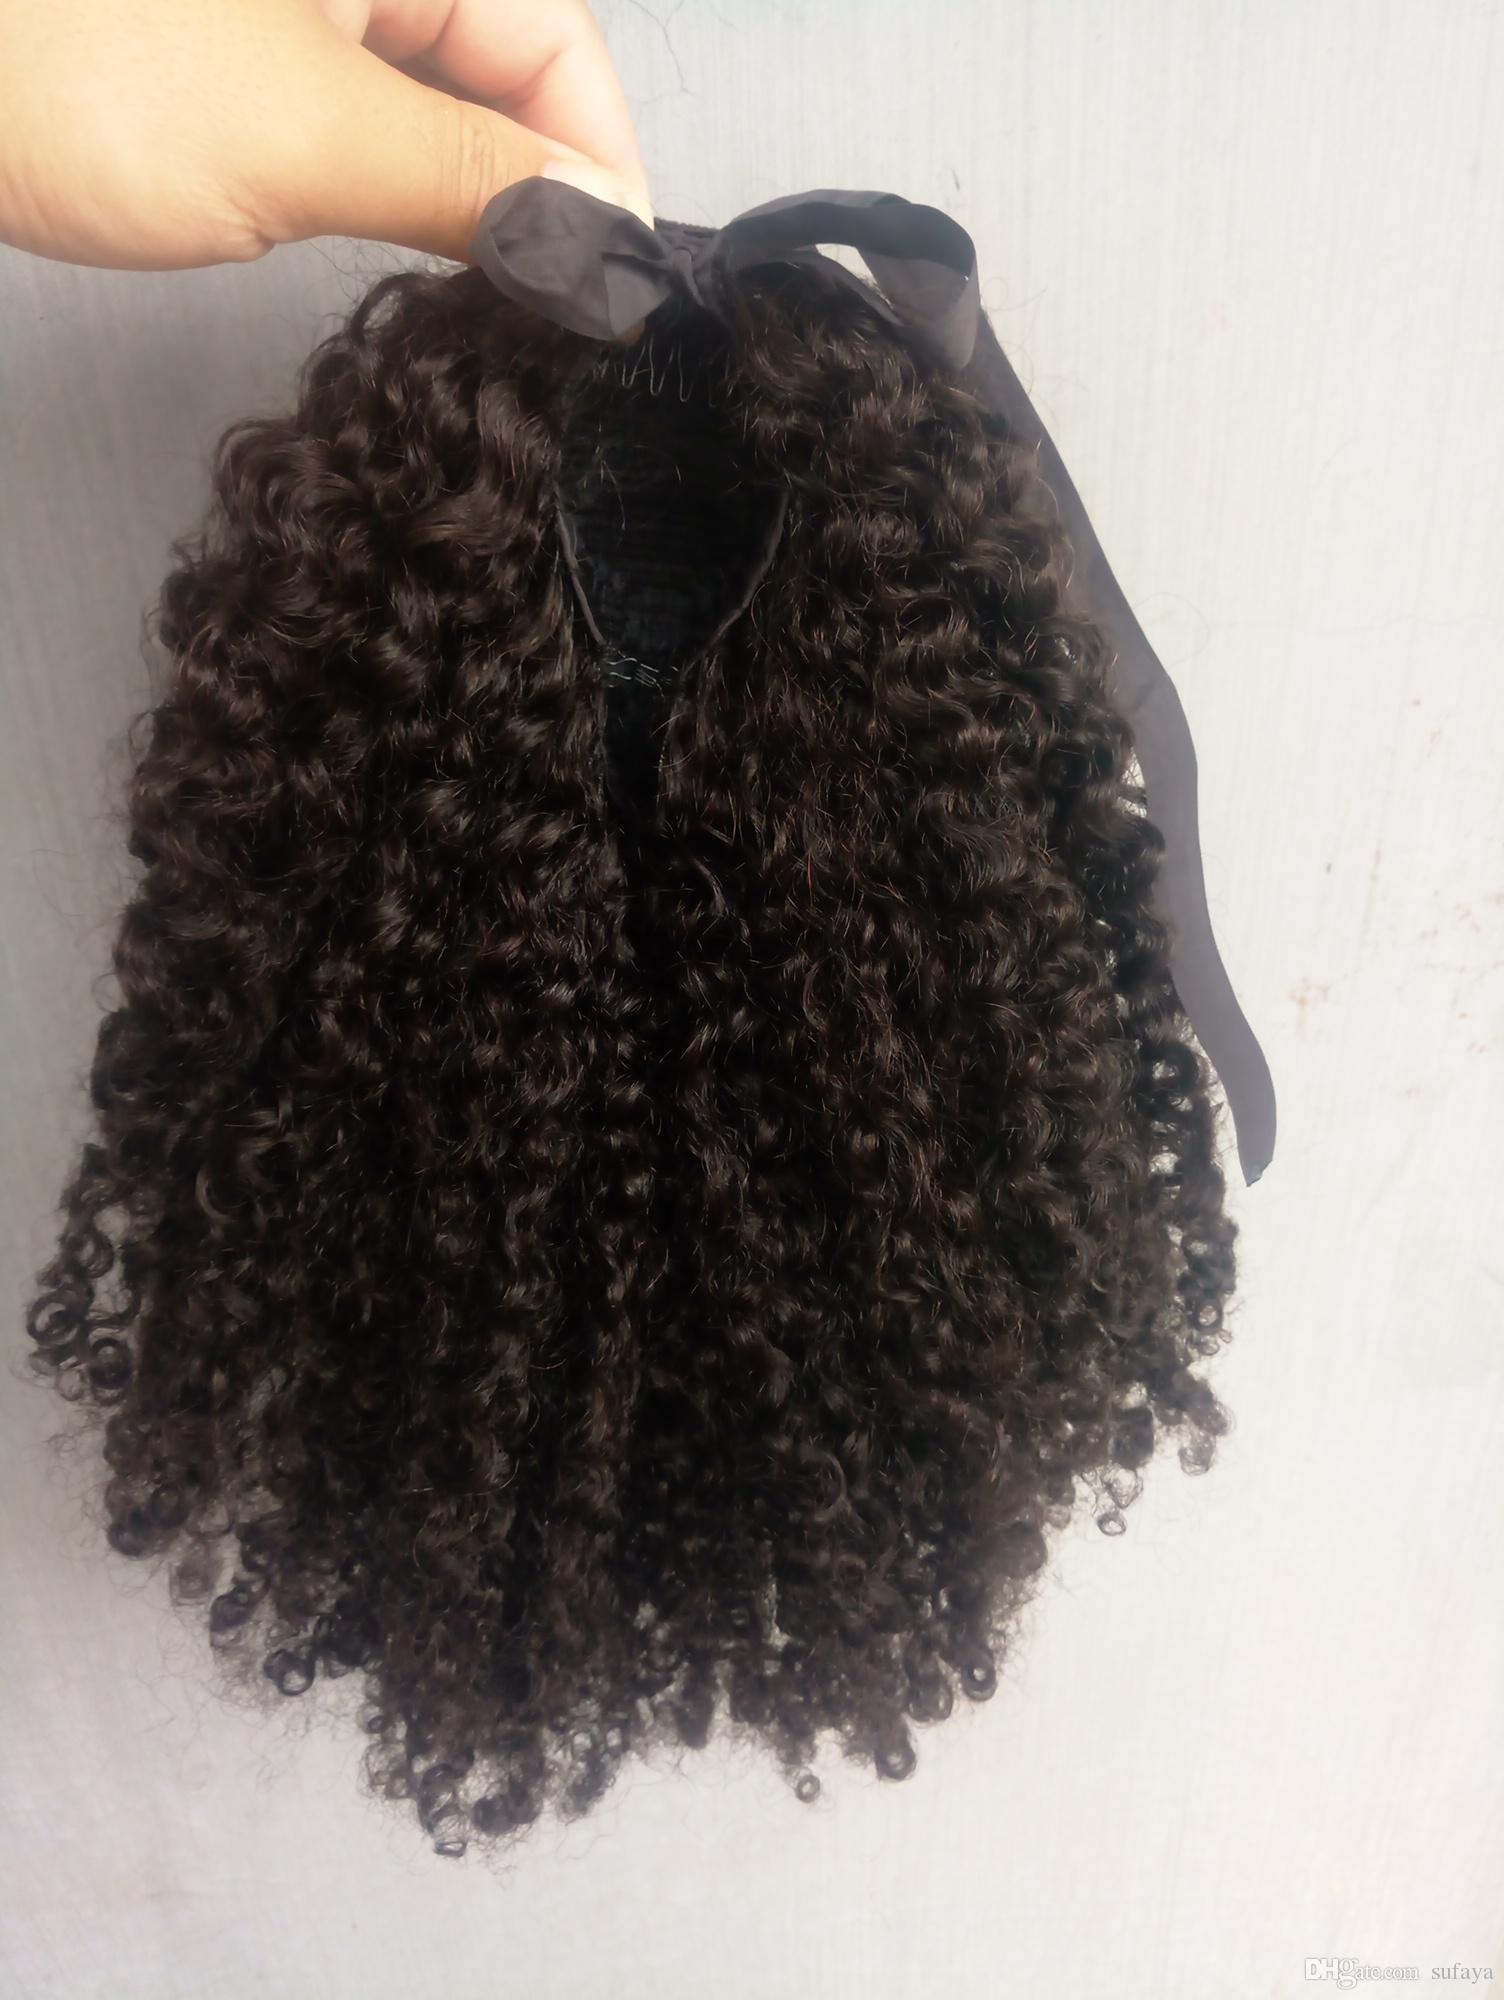 Sufaya Full Head Brazilian Human Virgin Remy Kinky Curly DrawstringPonytail Hair Extensions Natral Black Color 1b Color 150g one bundle